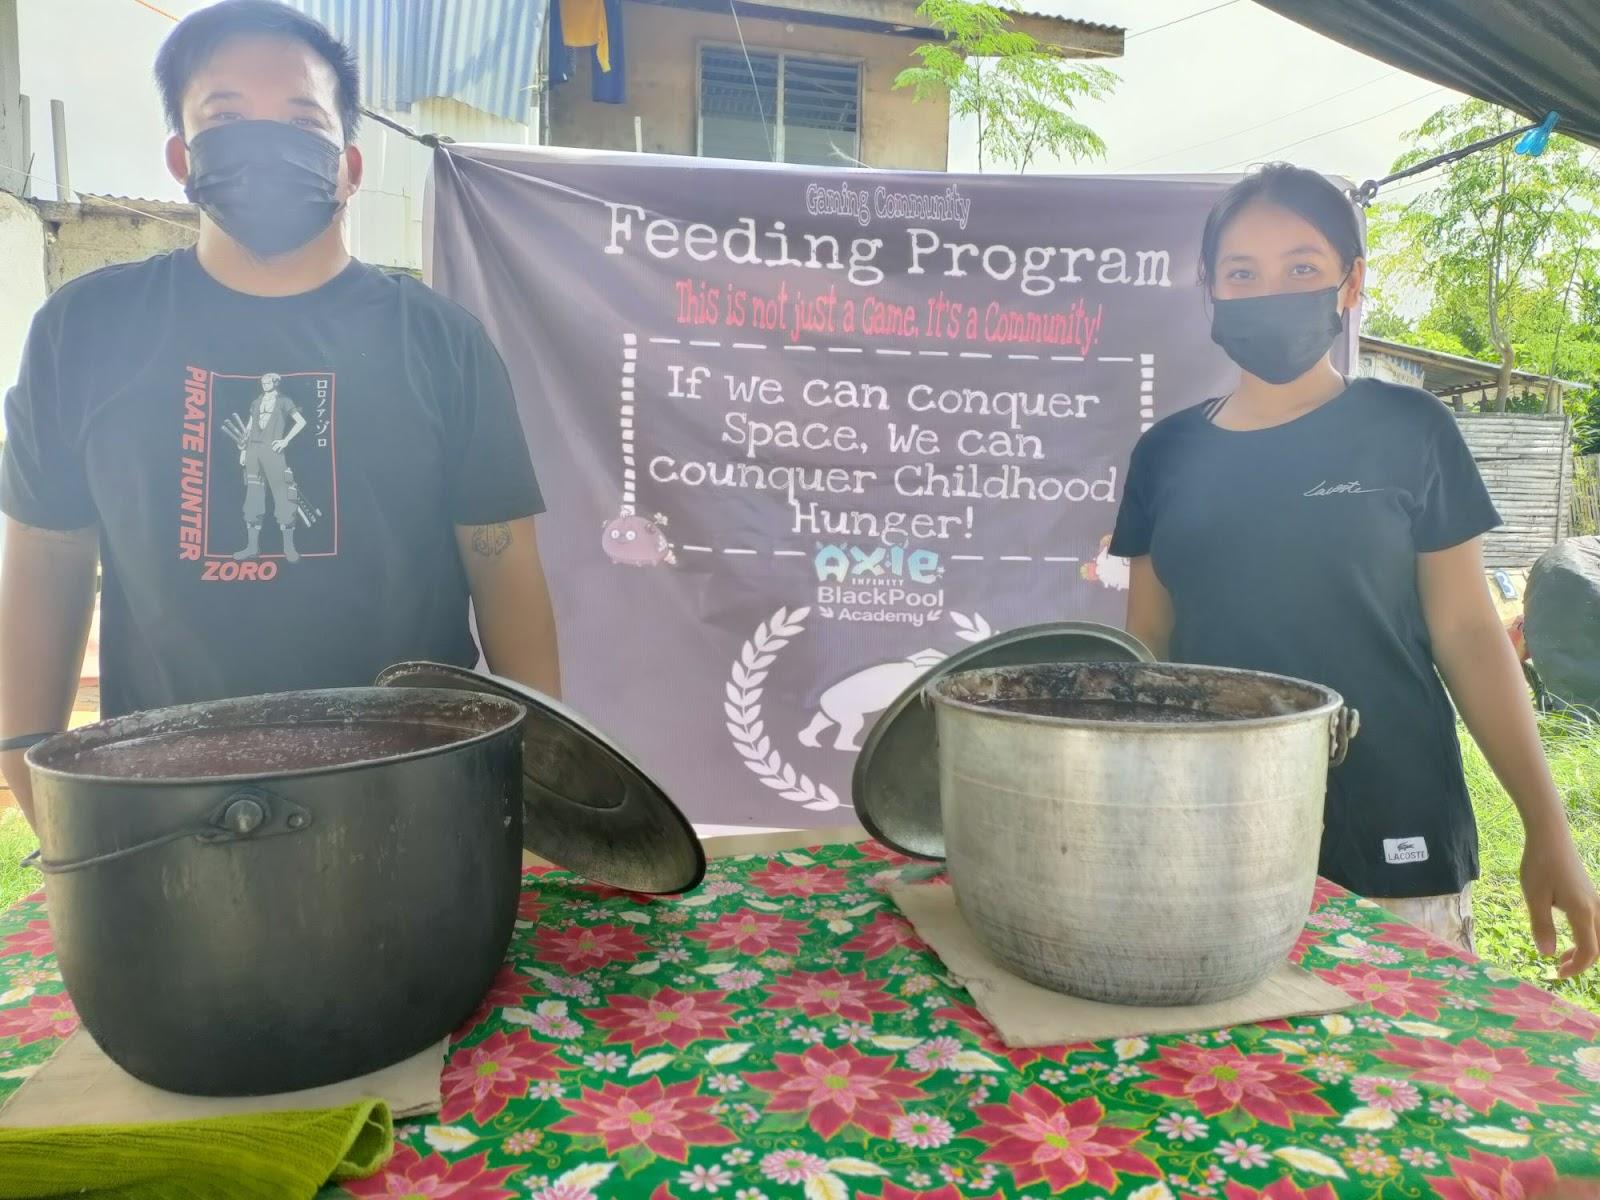 Rolando & Angelica Cantero, Founders of Gaming Community Feeding Program